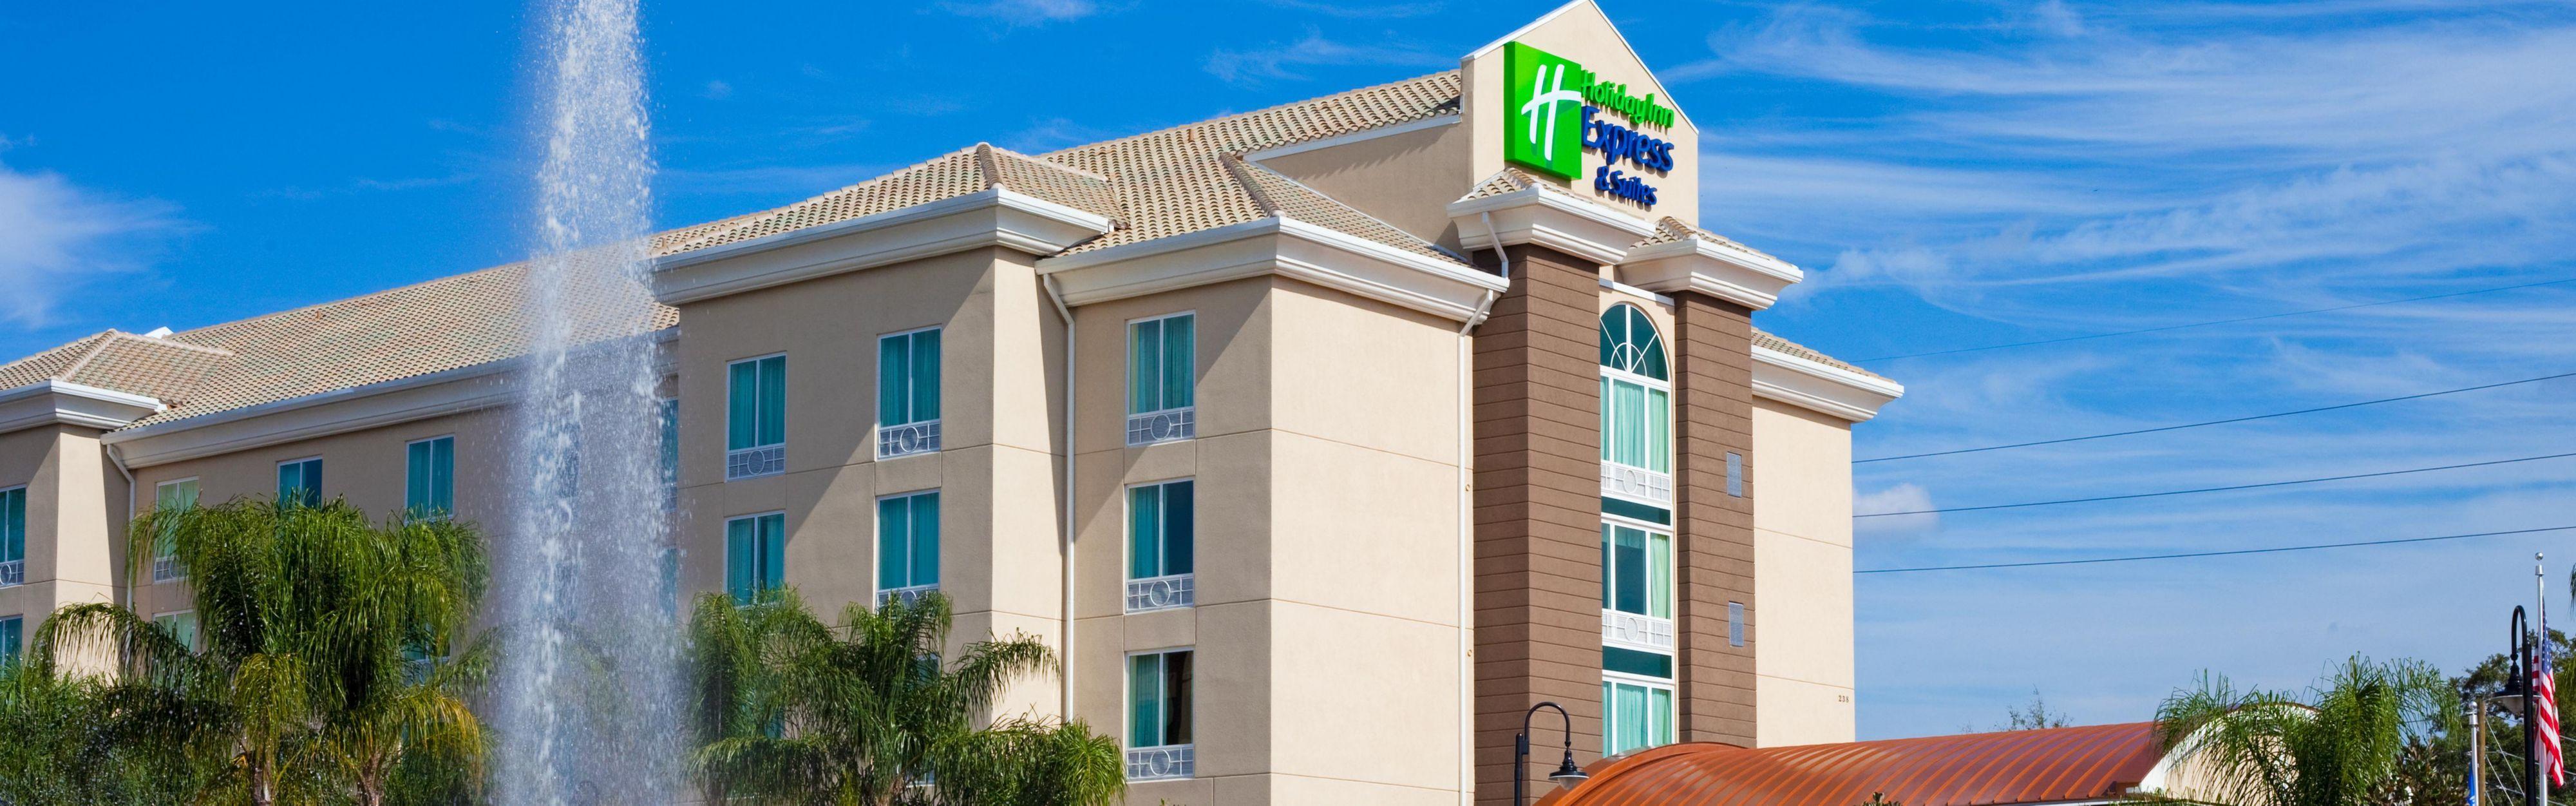 Holiday Inn Express & Suites Orlando - Apopka image 0